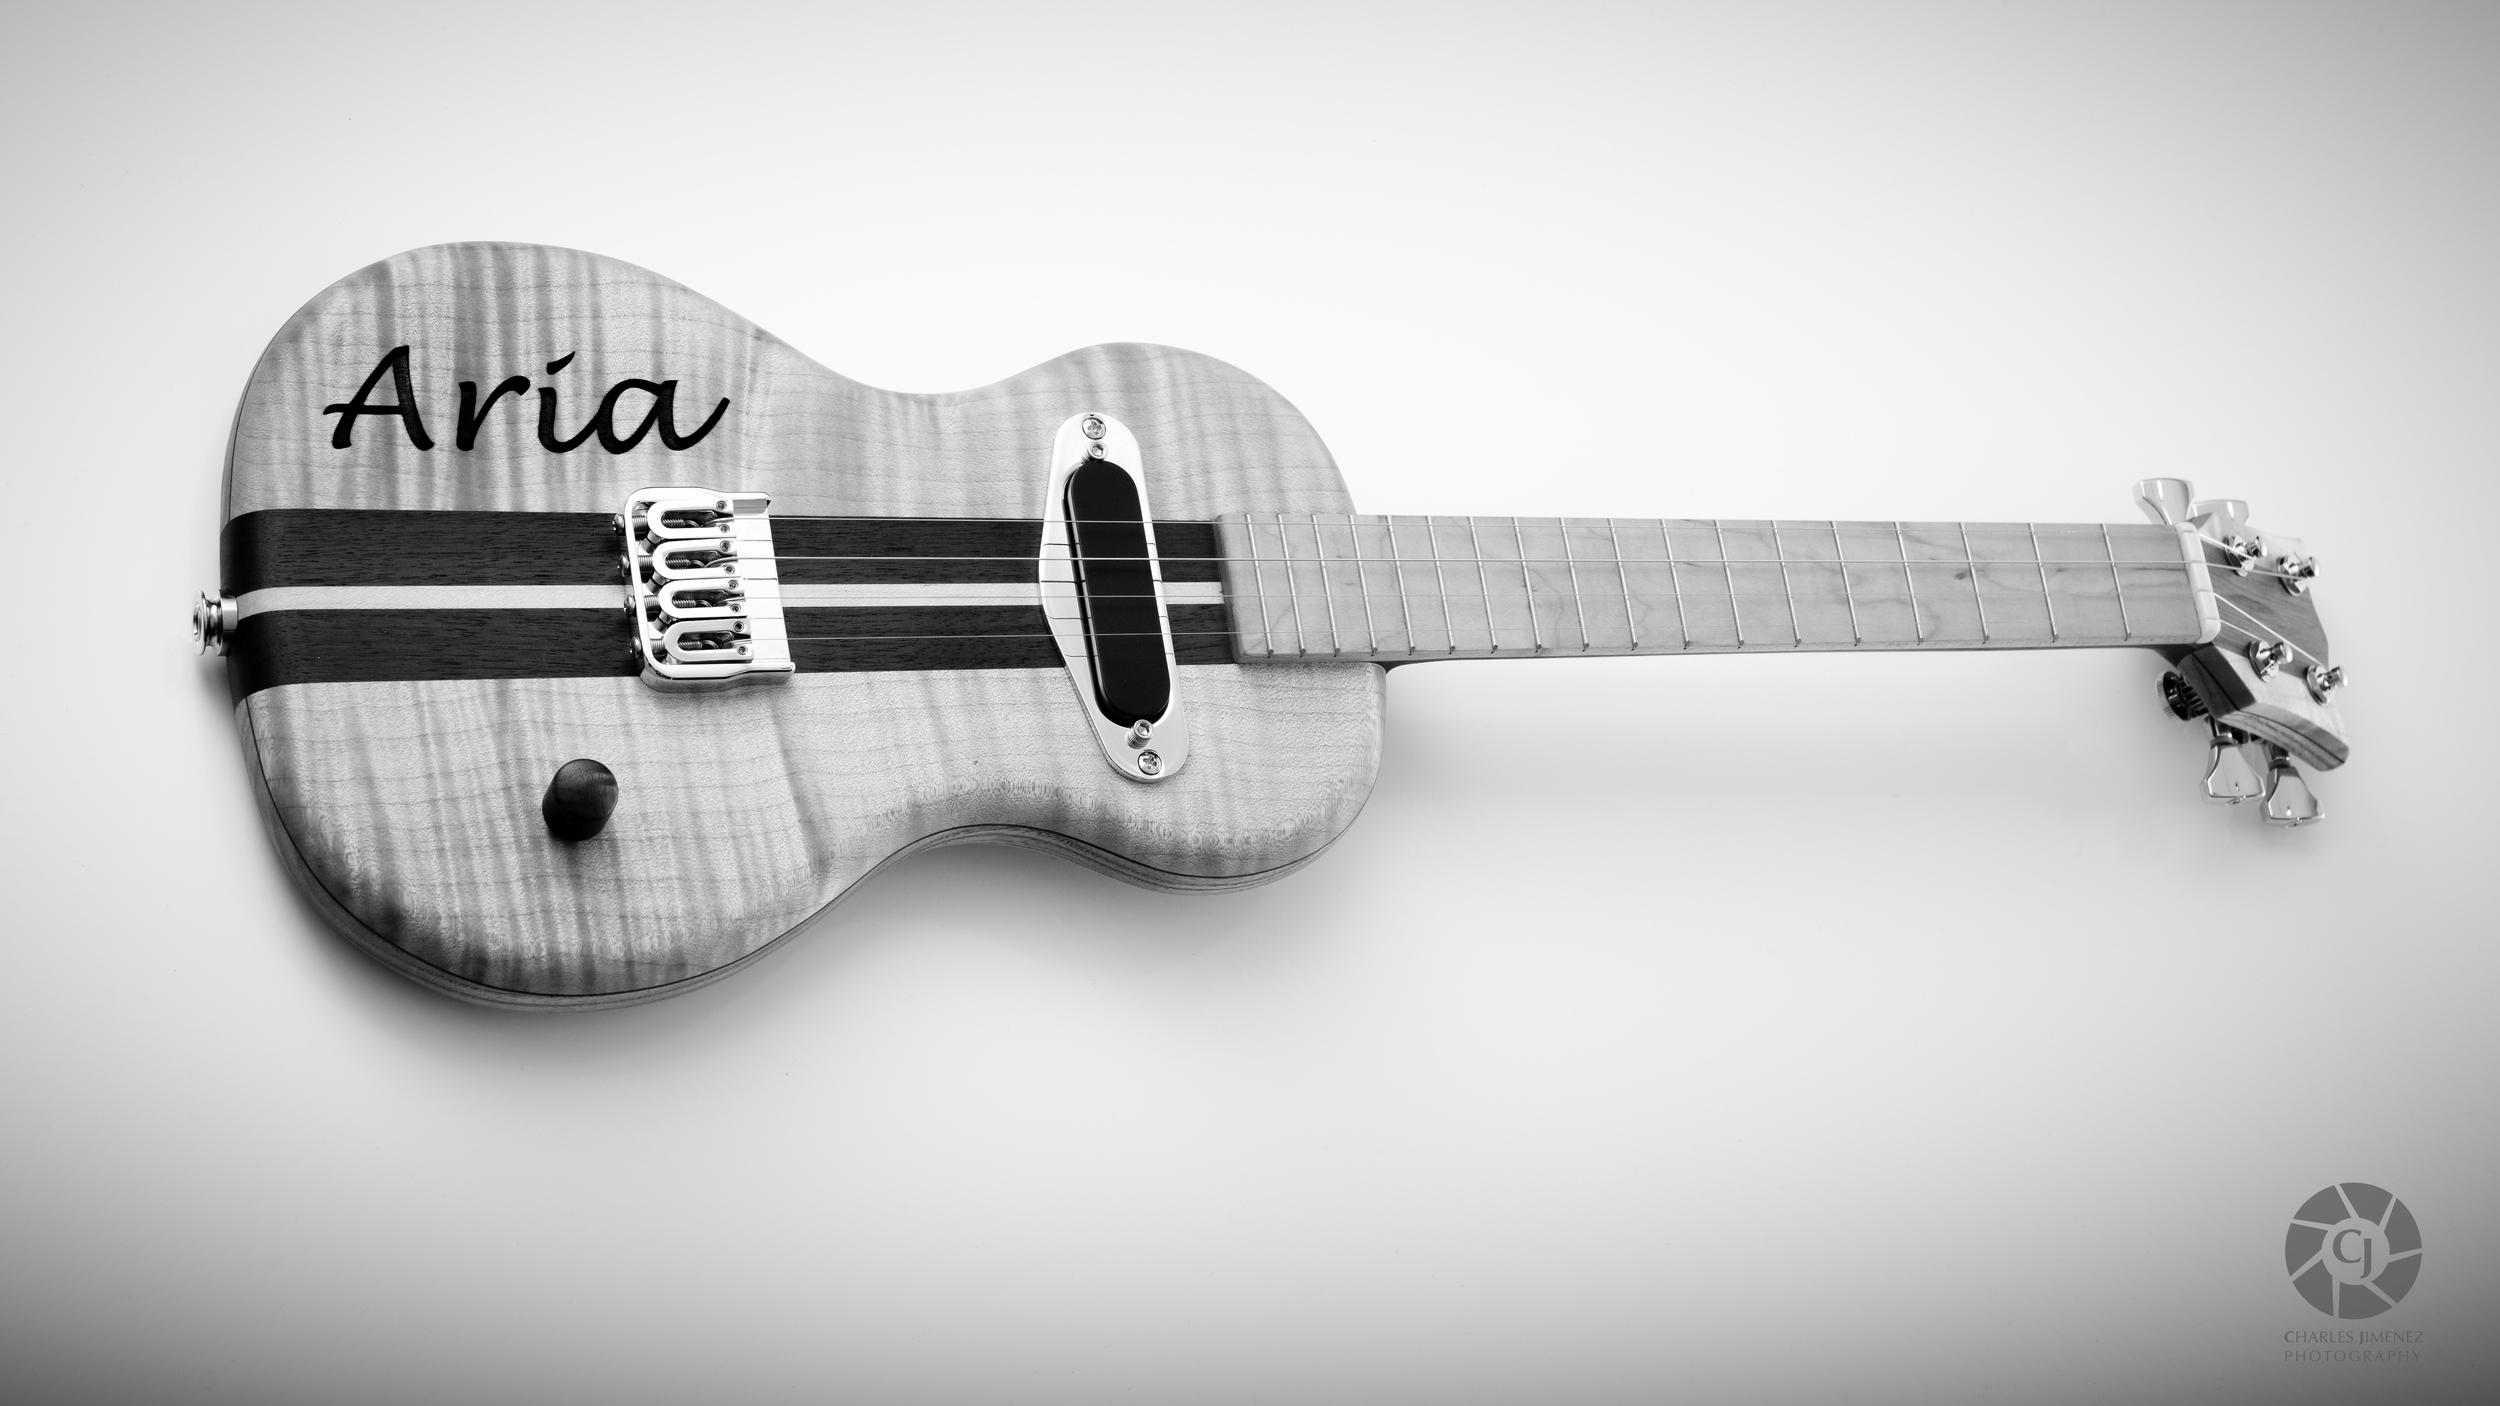 Better Mousetrap Guitars_Aria Ukulele_8-25-13_15.jpg